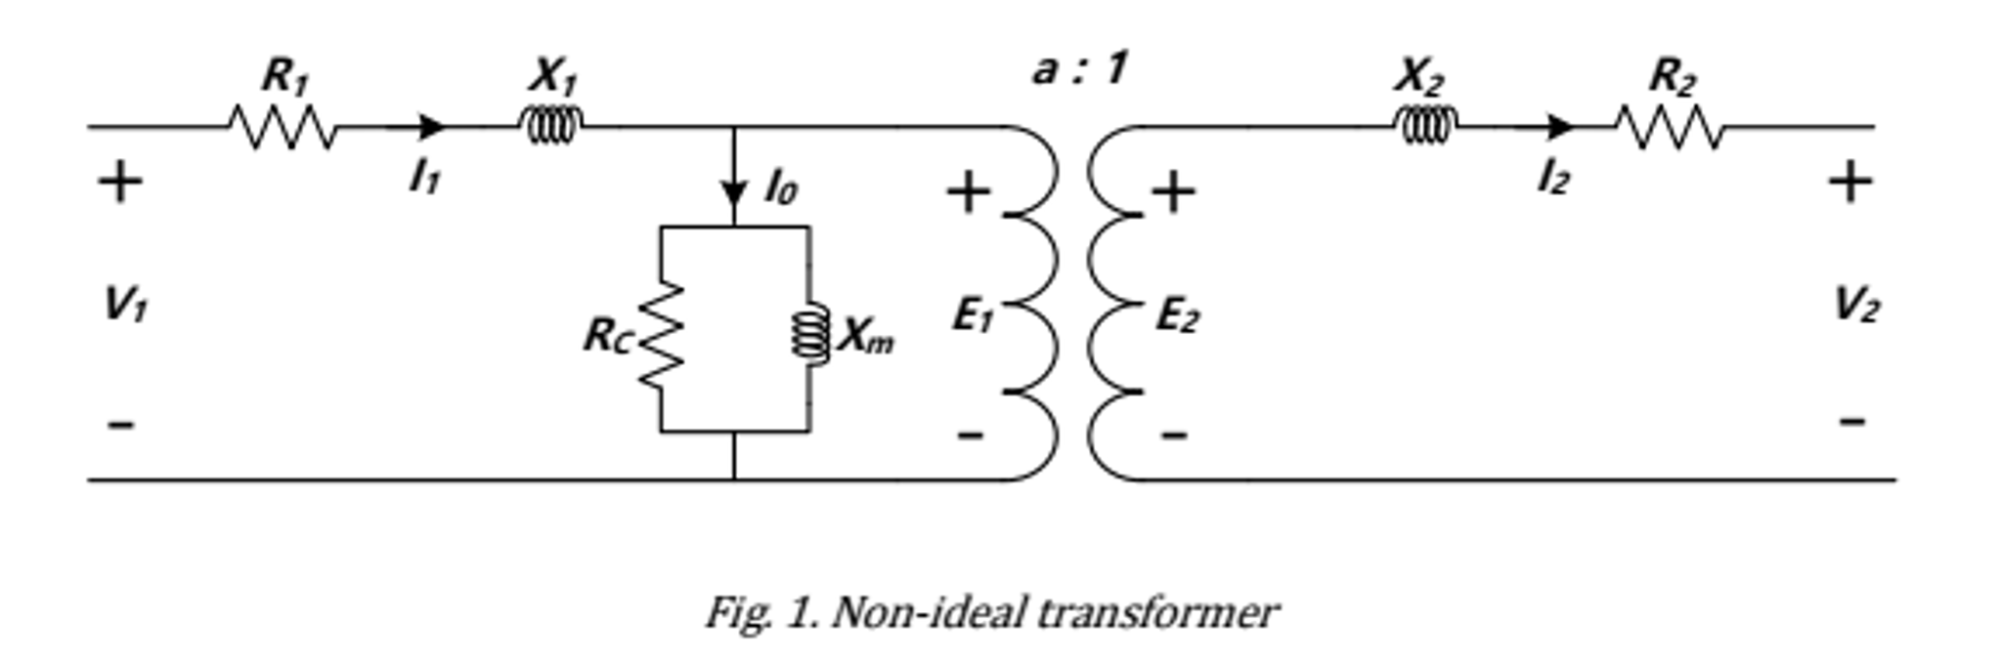 hight resolution of non ideal transformer